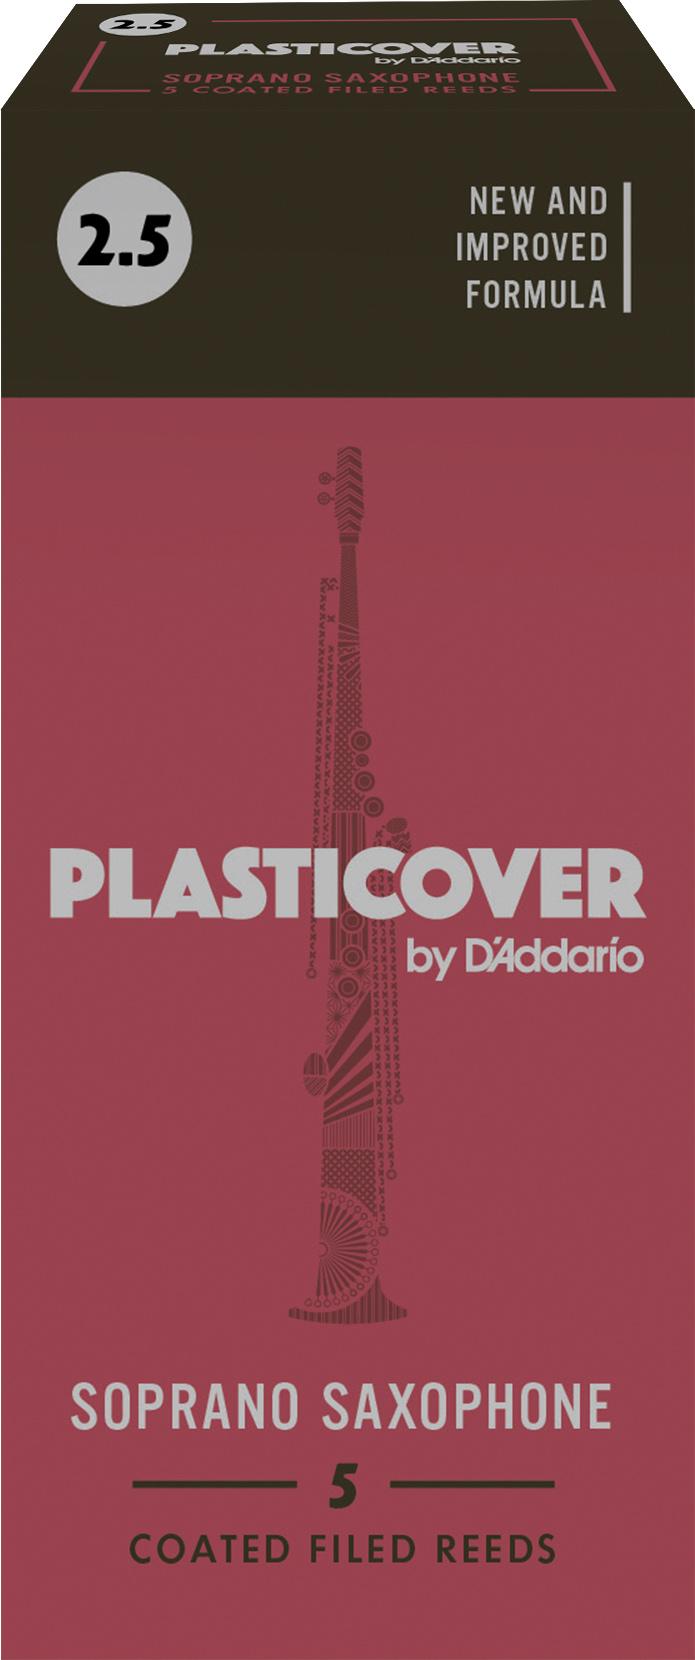 D'Addario Plasticover Soprano Sax Reeds 2.5, 5-pack